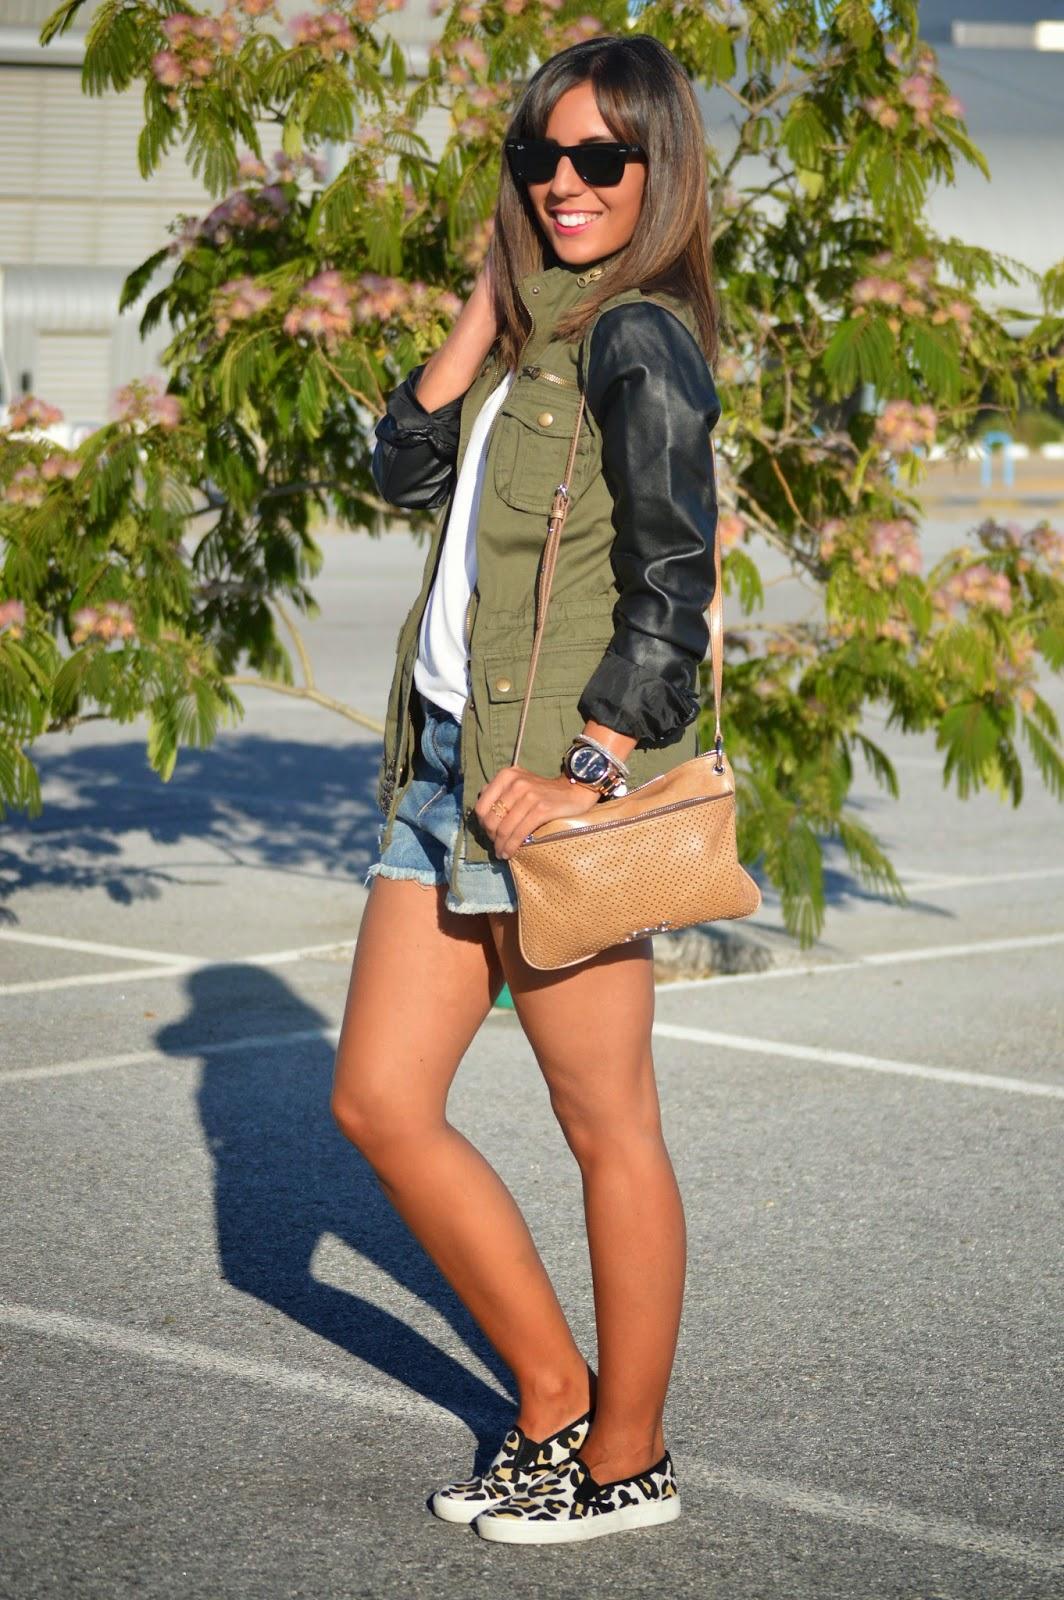 street style cristina style style fashion blogger malagueña blogger malagueña outfit look inspiration spring chic mango slip on zara girl amazing gorgeous styles stilish purse awesome swag